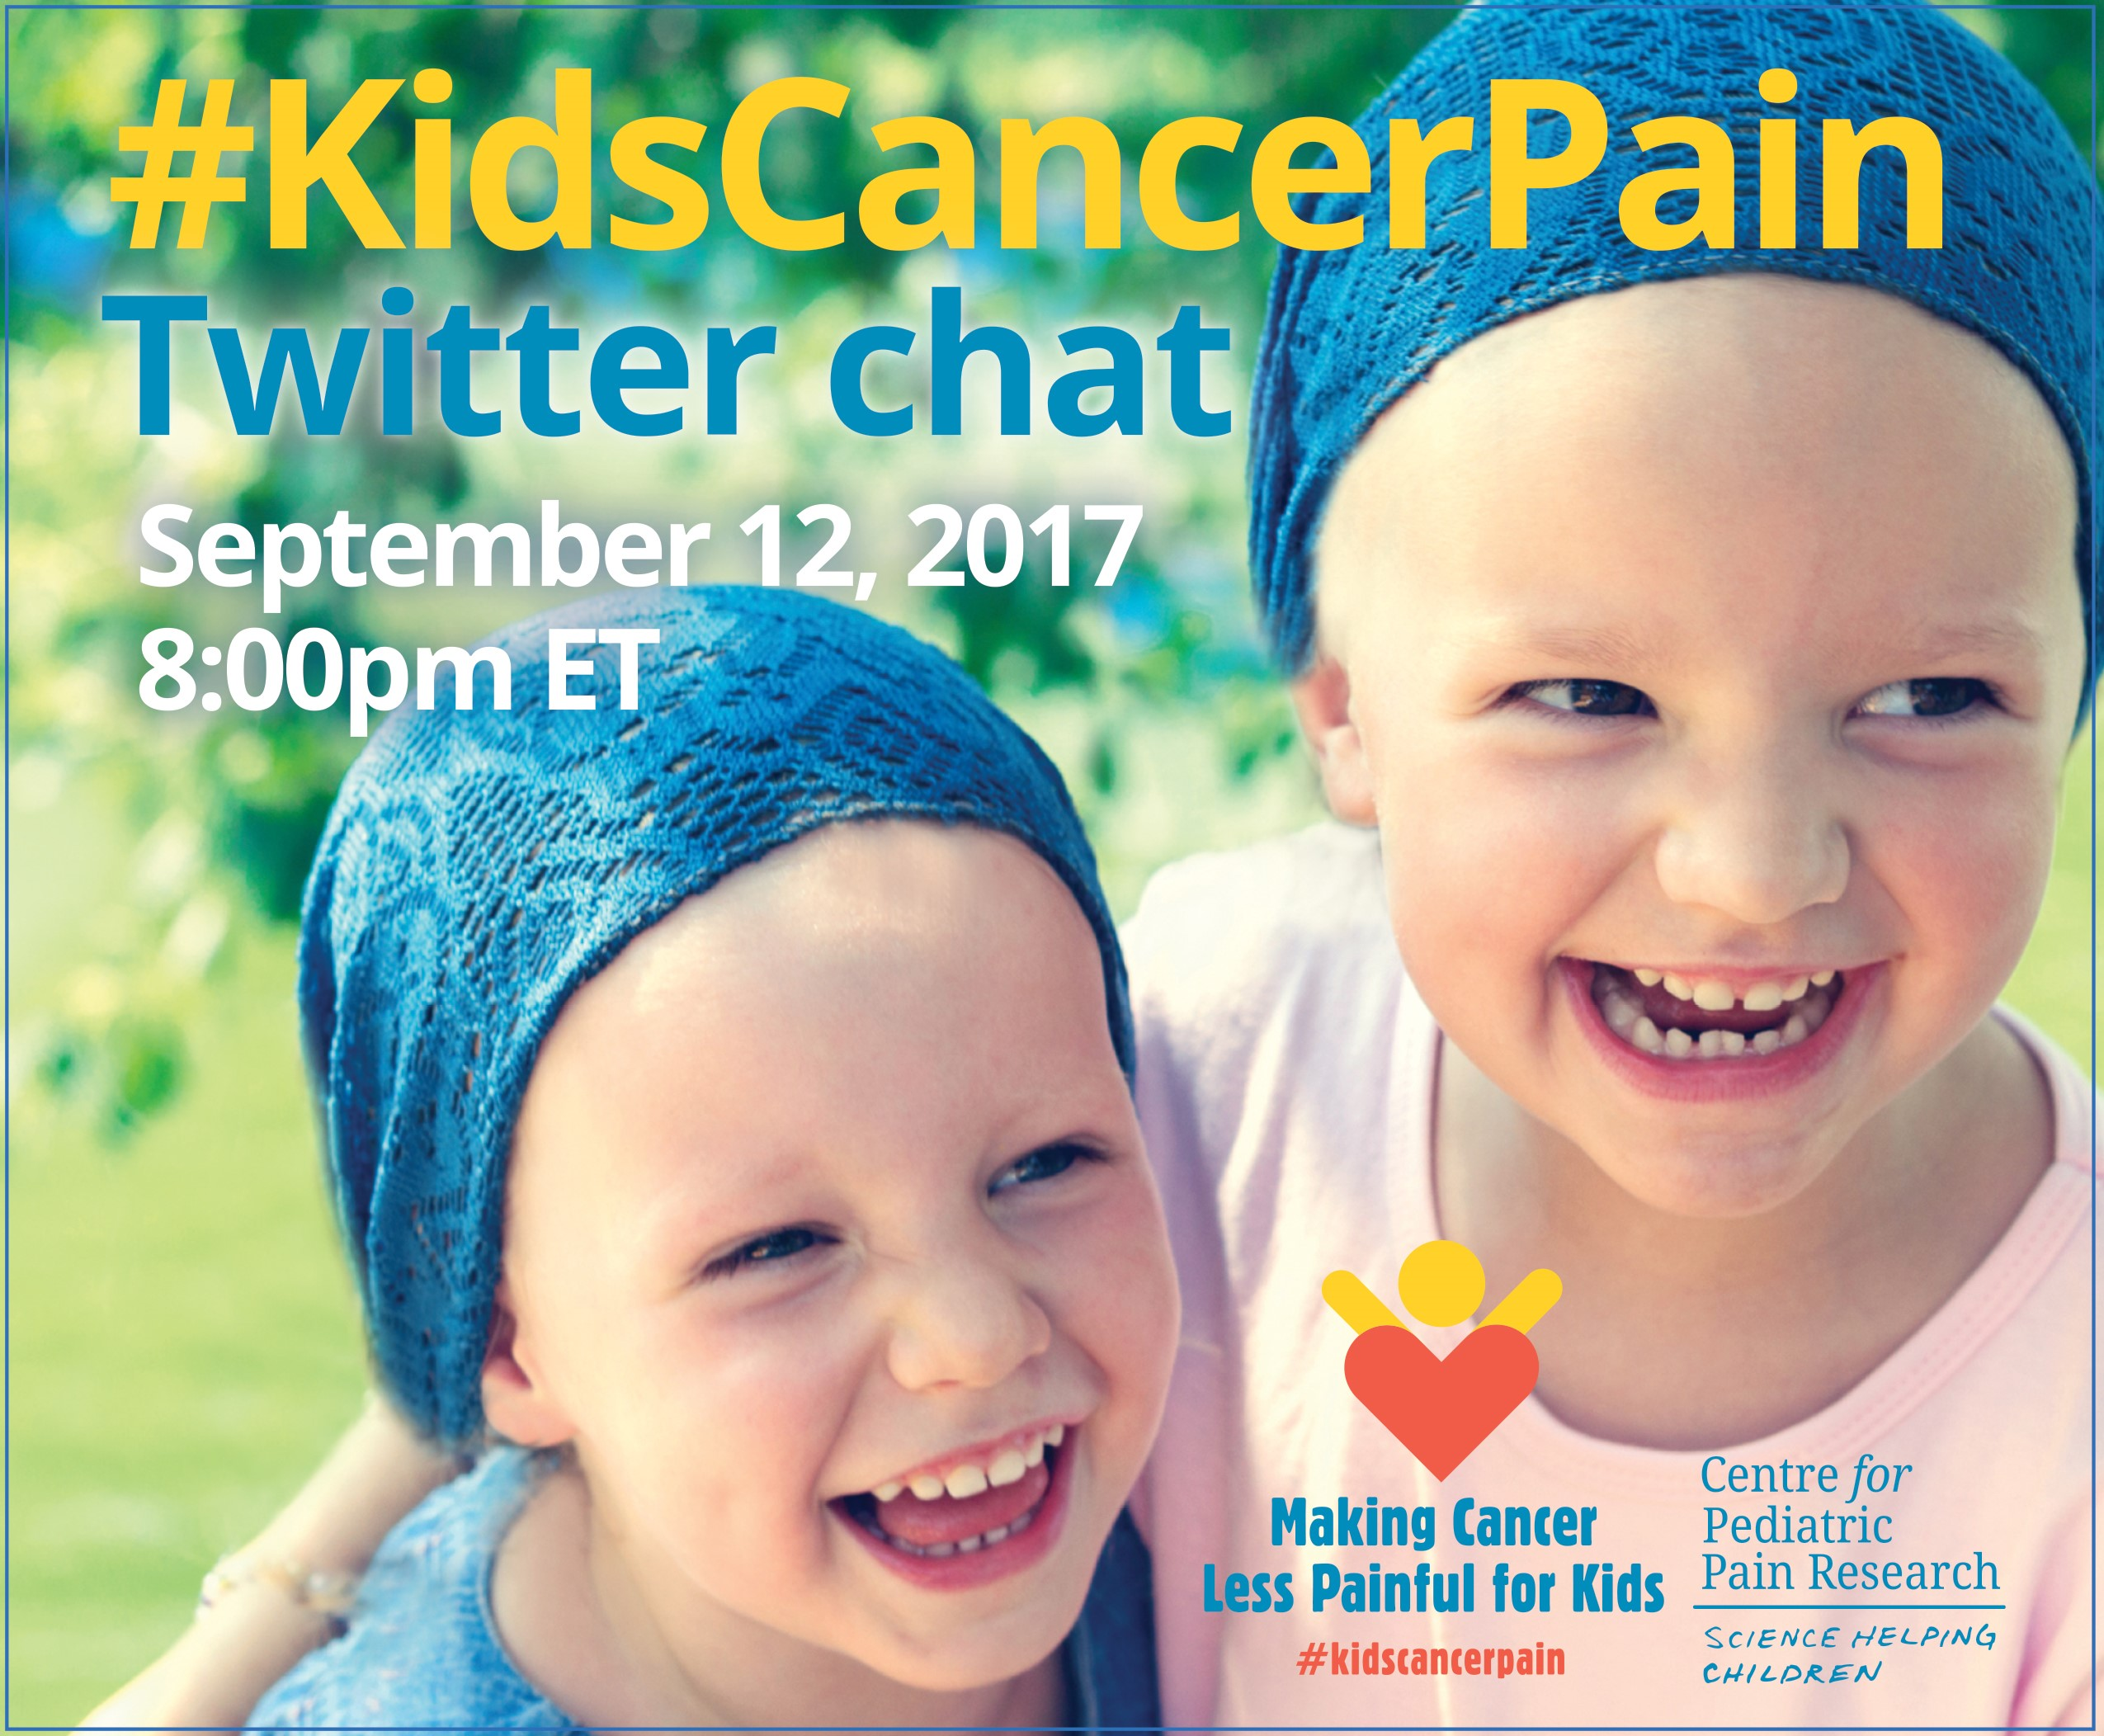 #KidsCancerPain Twitter Chat